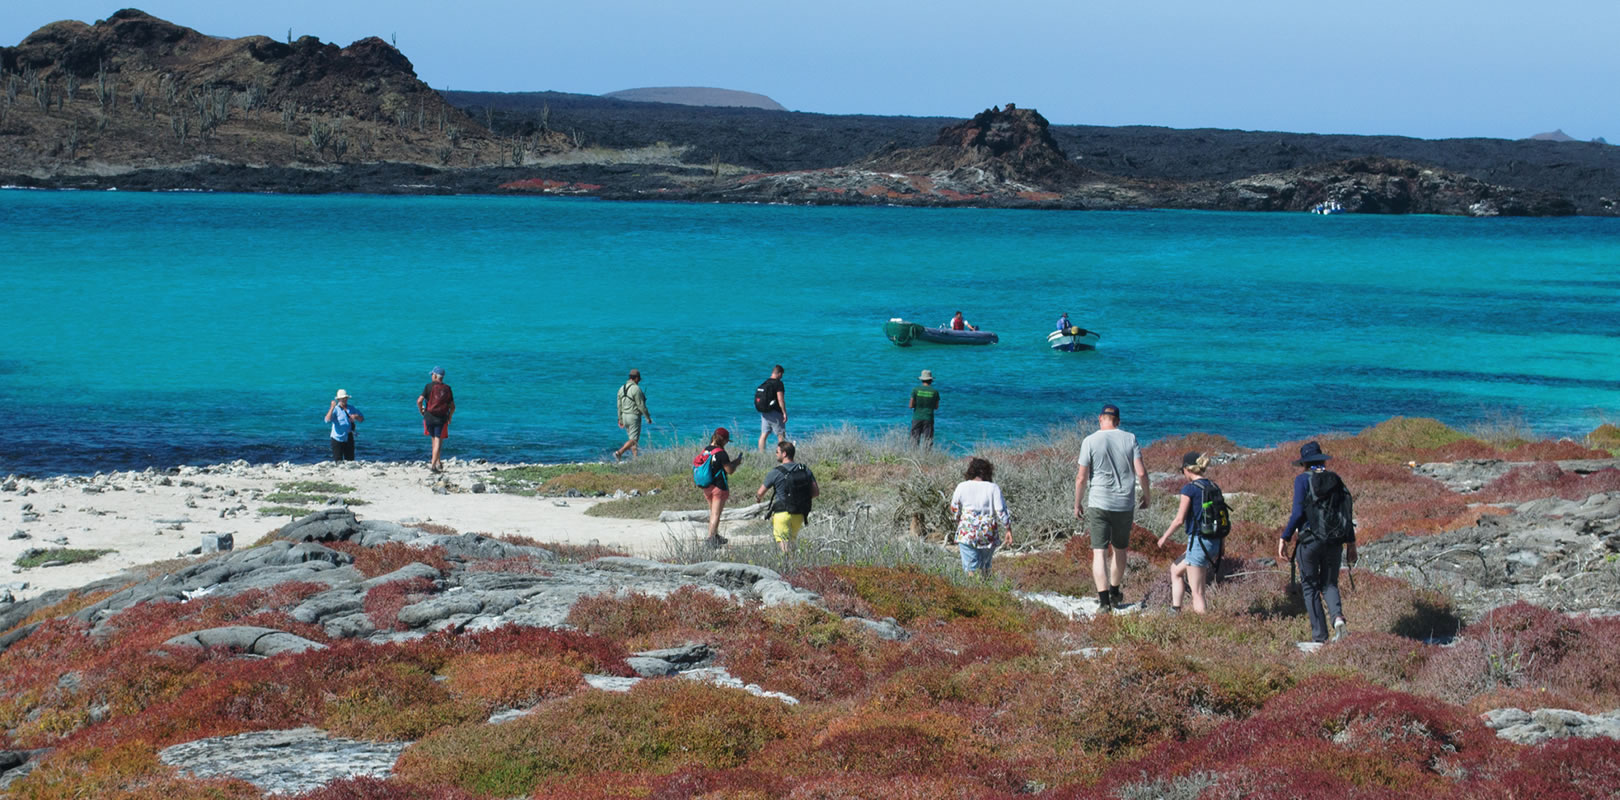 Galapagos Cruise: Sailing on the Golondrina Yacht